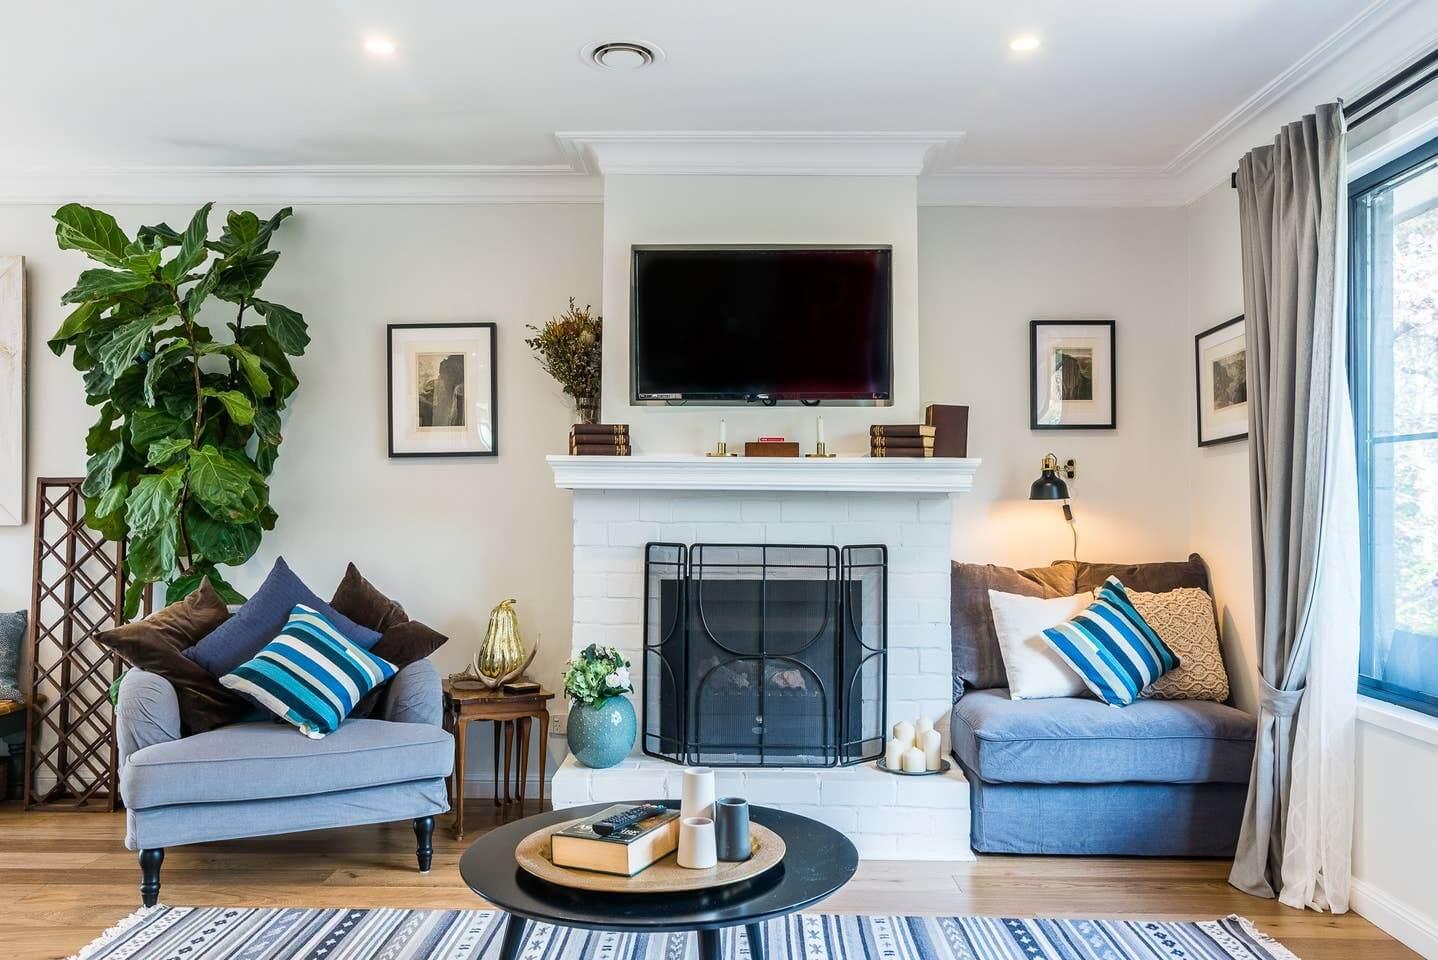 airbnb-management-blue-mountains-showcase-blackheath